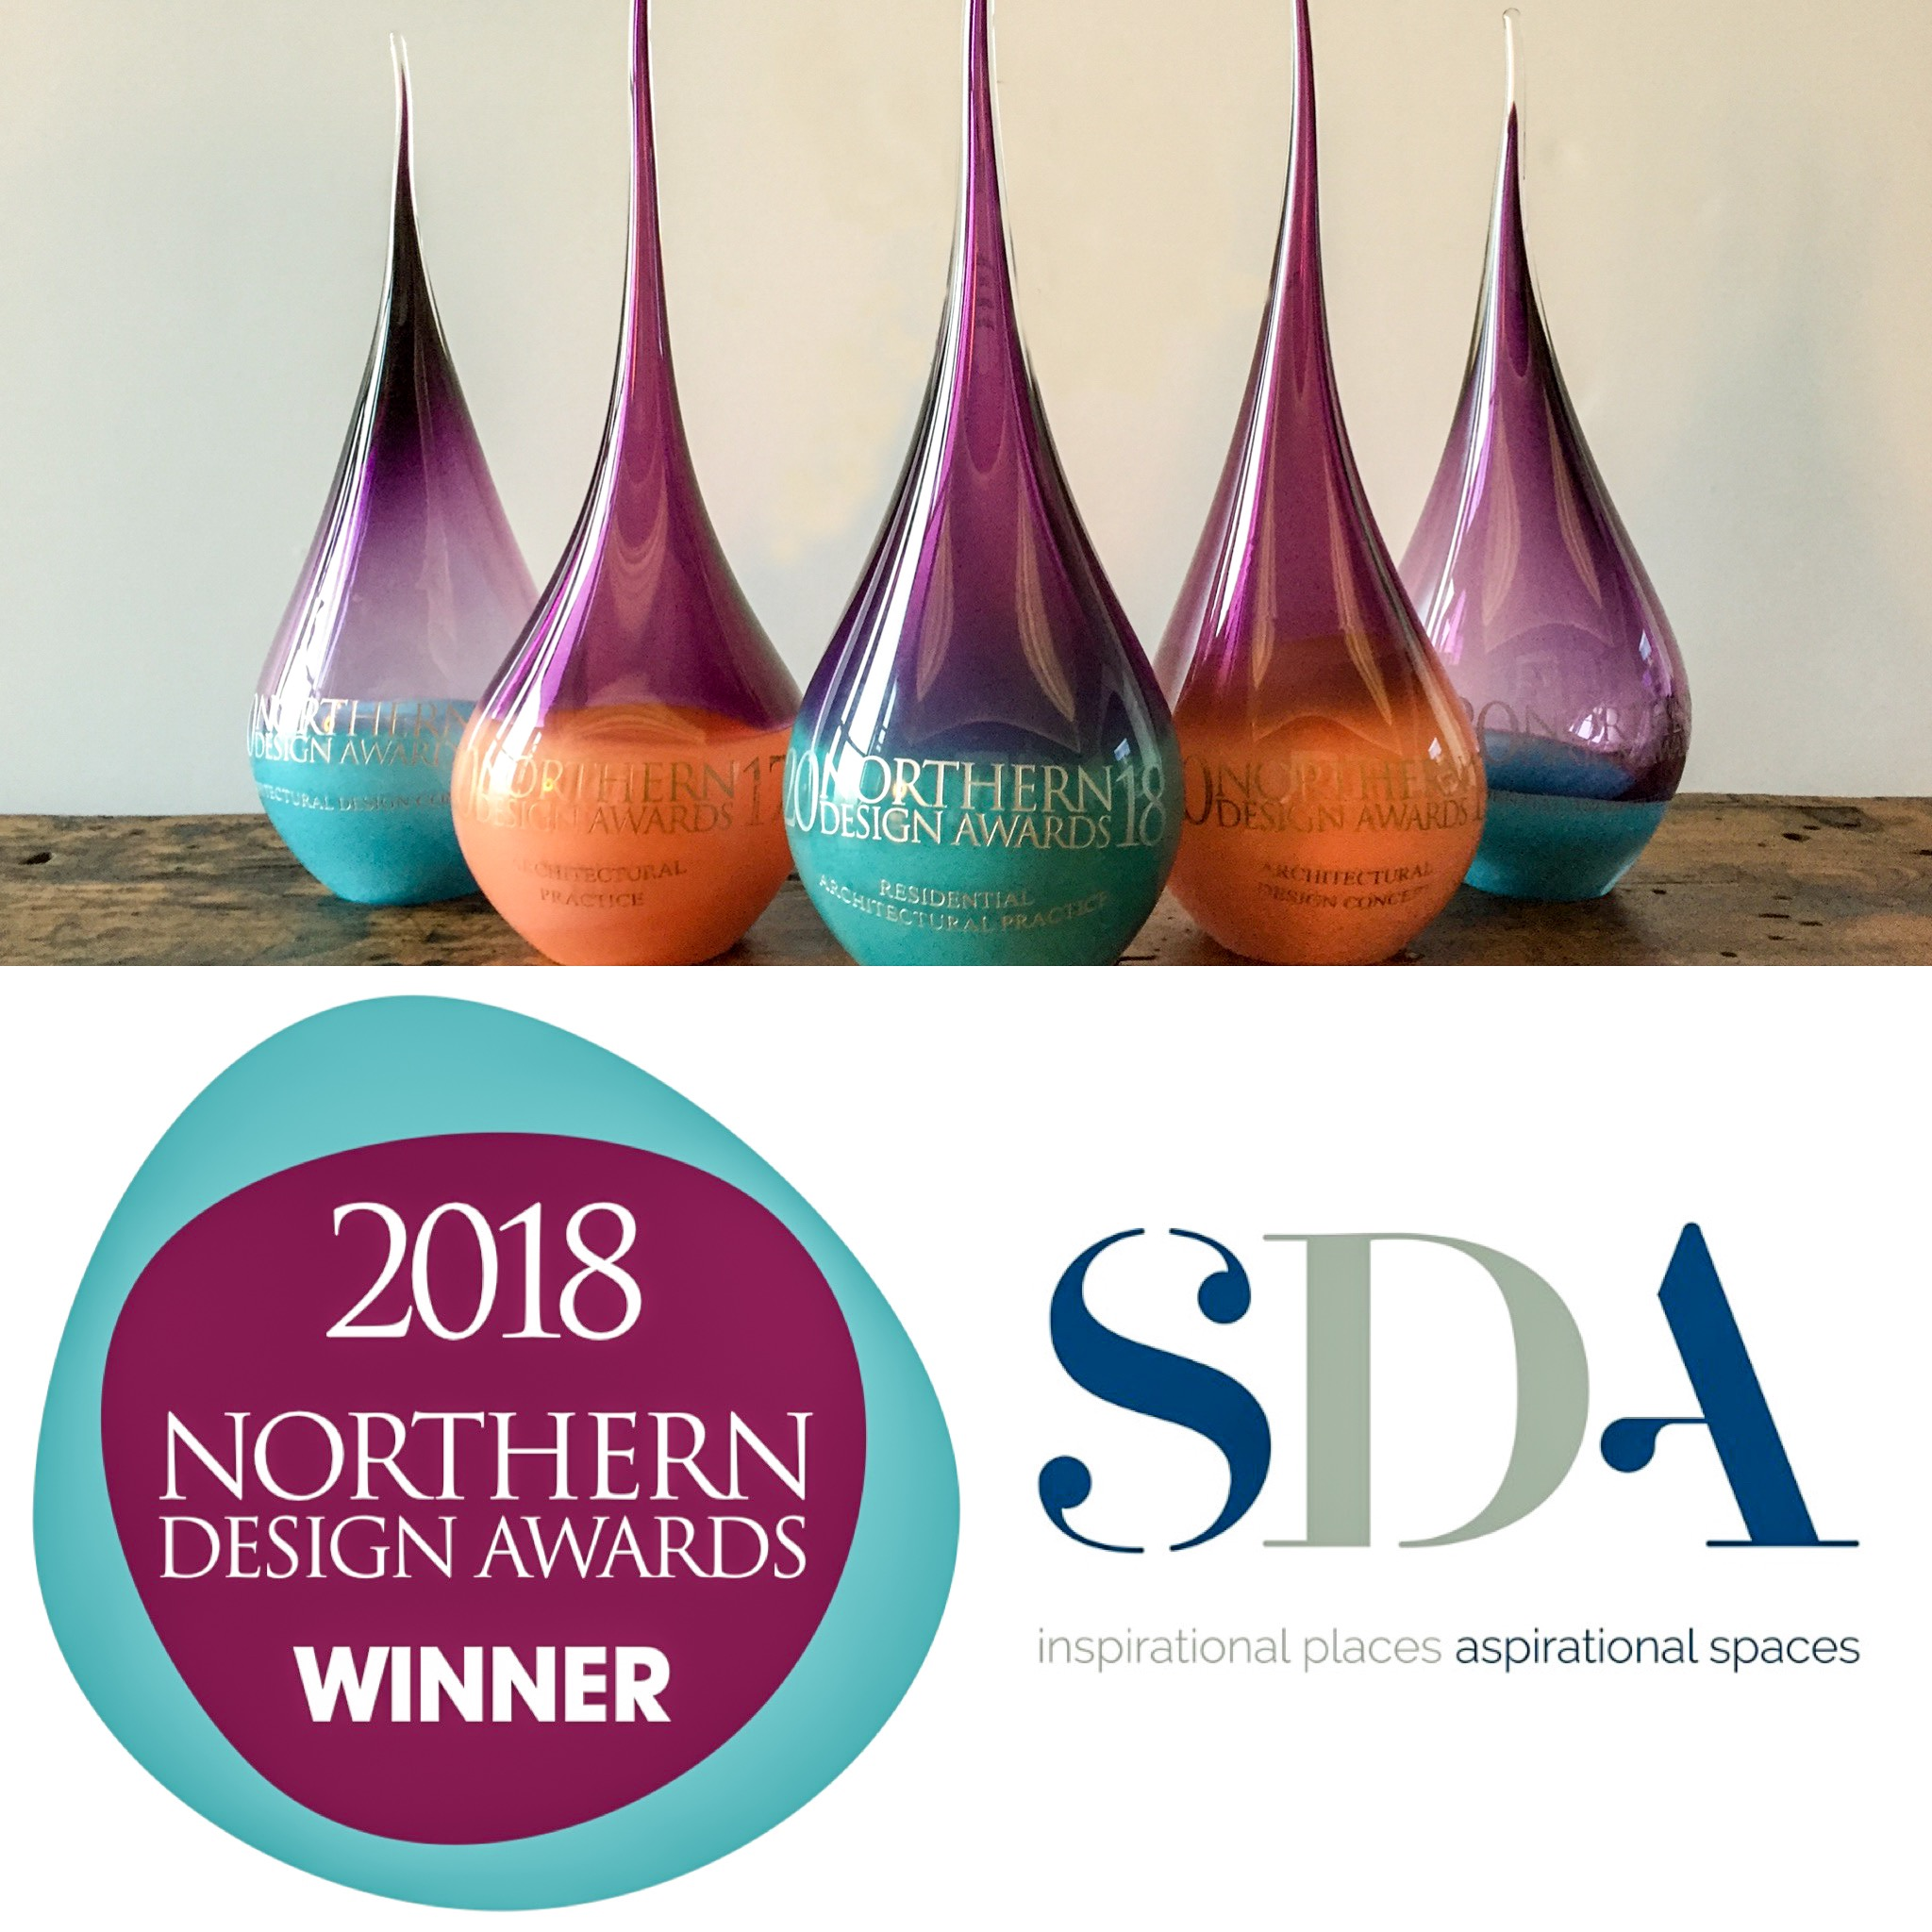 SDA win the 2018 Nothern Design awards.